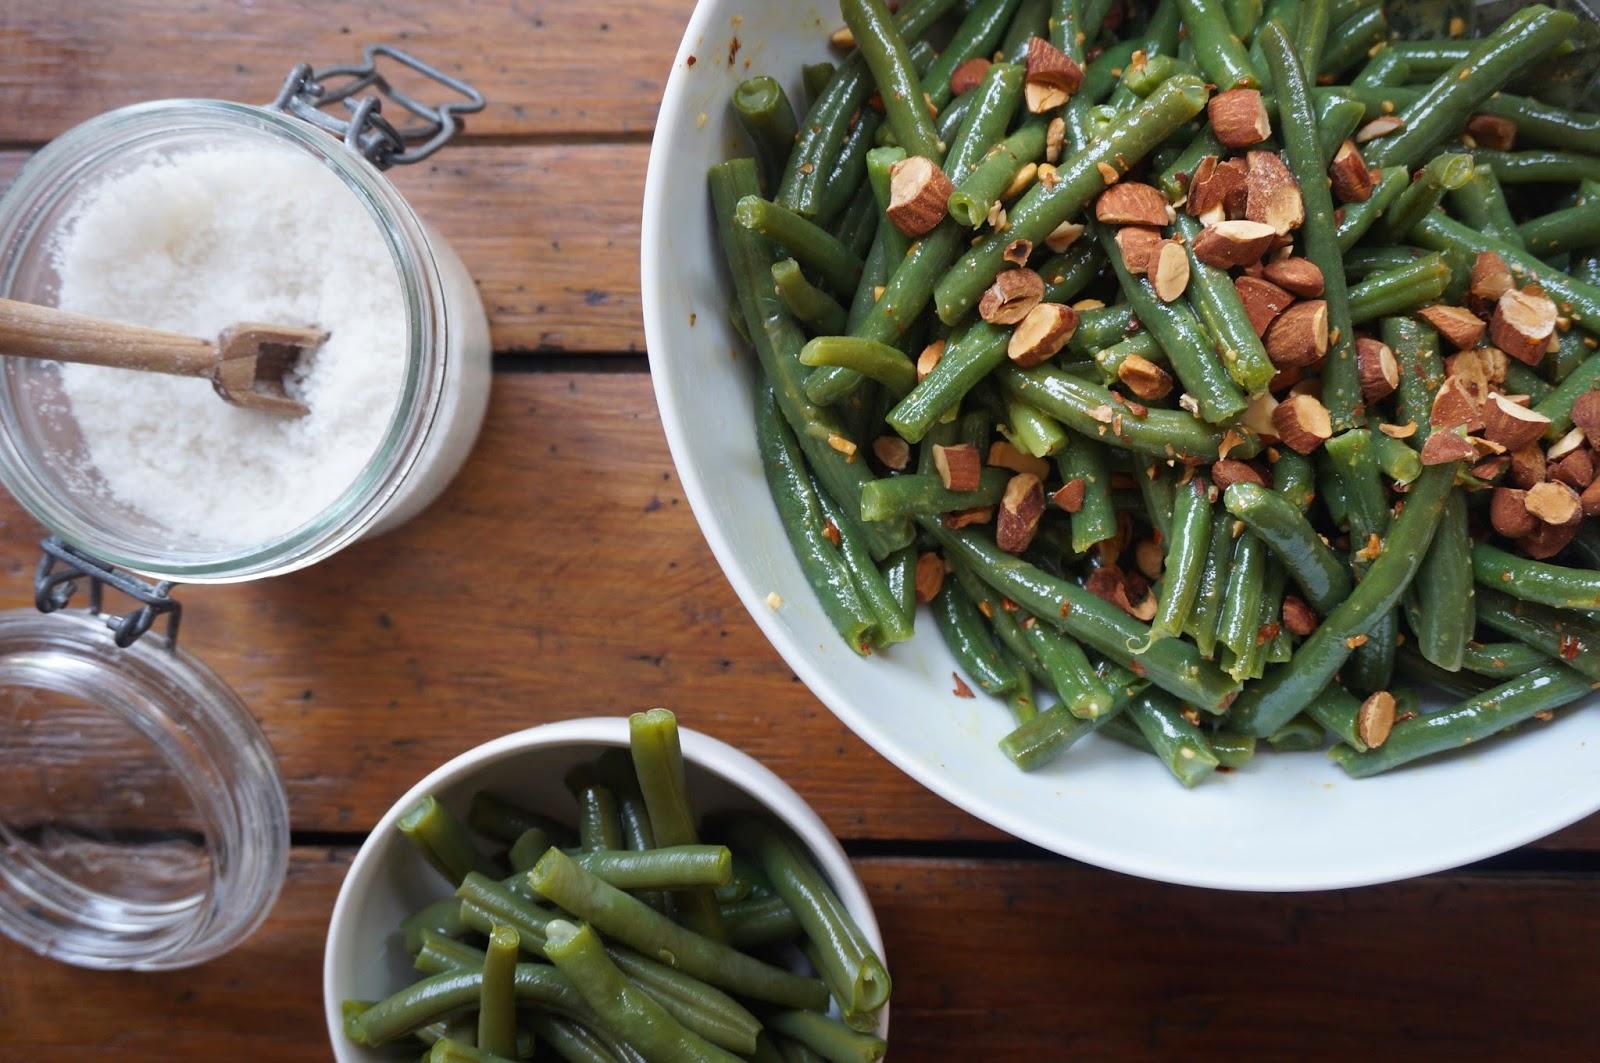 Recettes salades originales pour barbecue - Idee originale barbecue ...